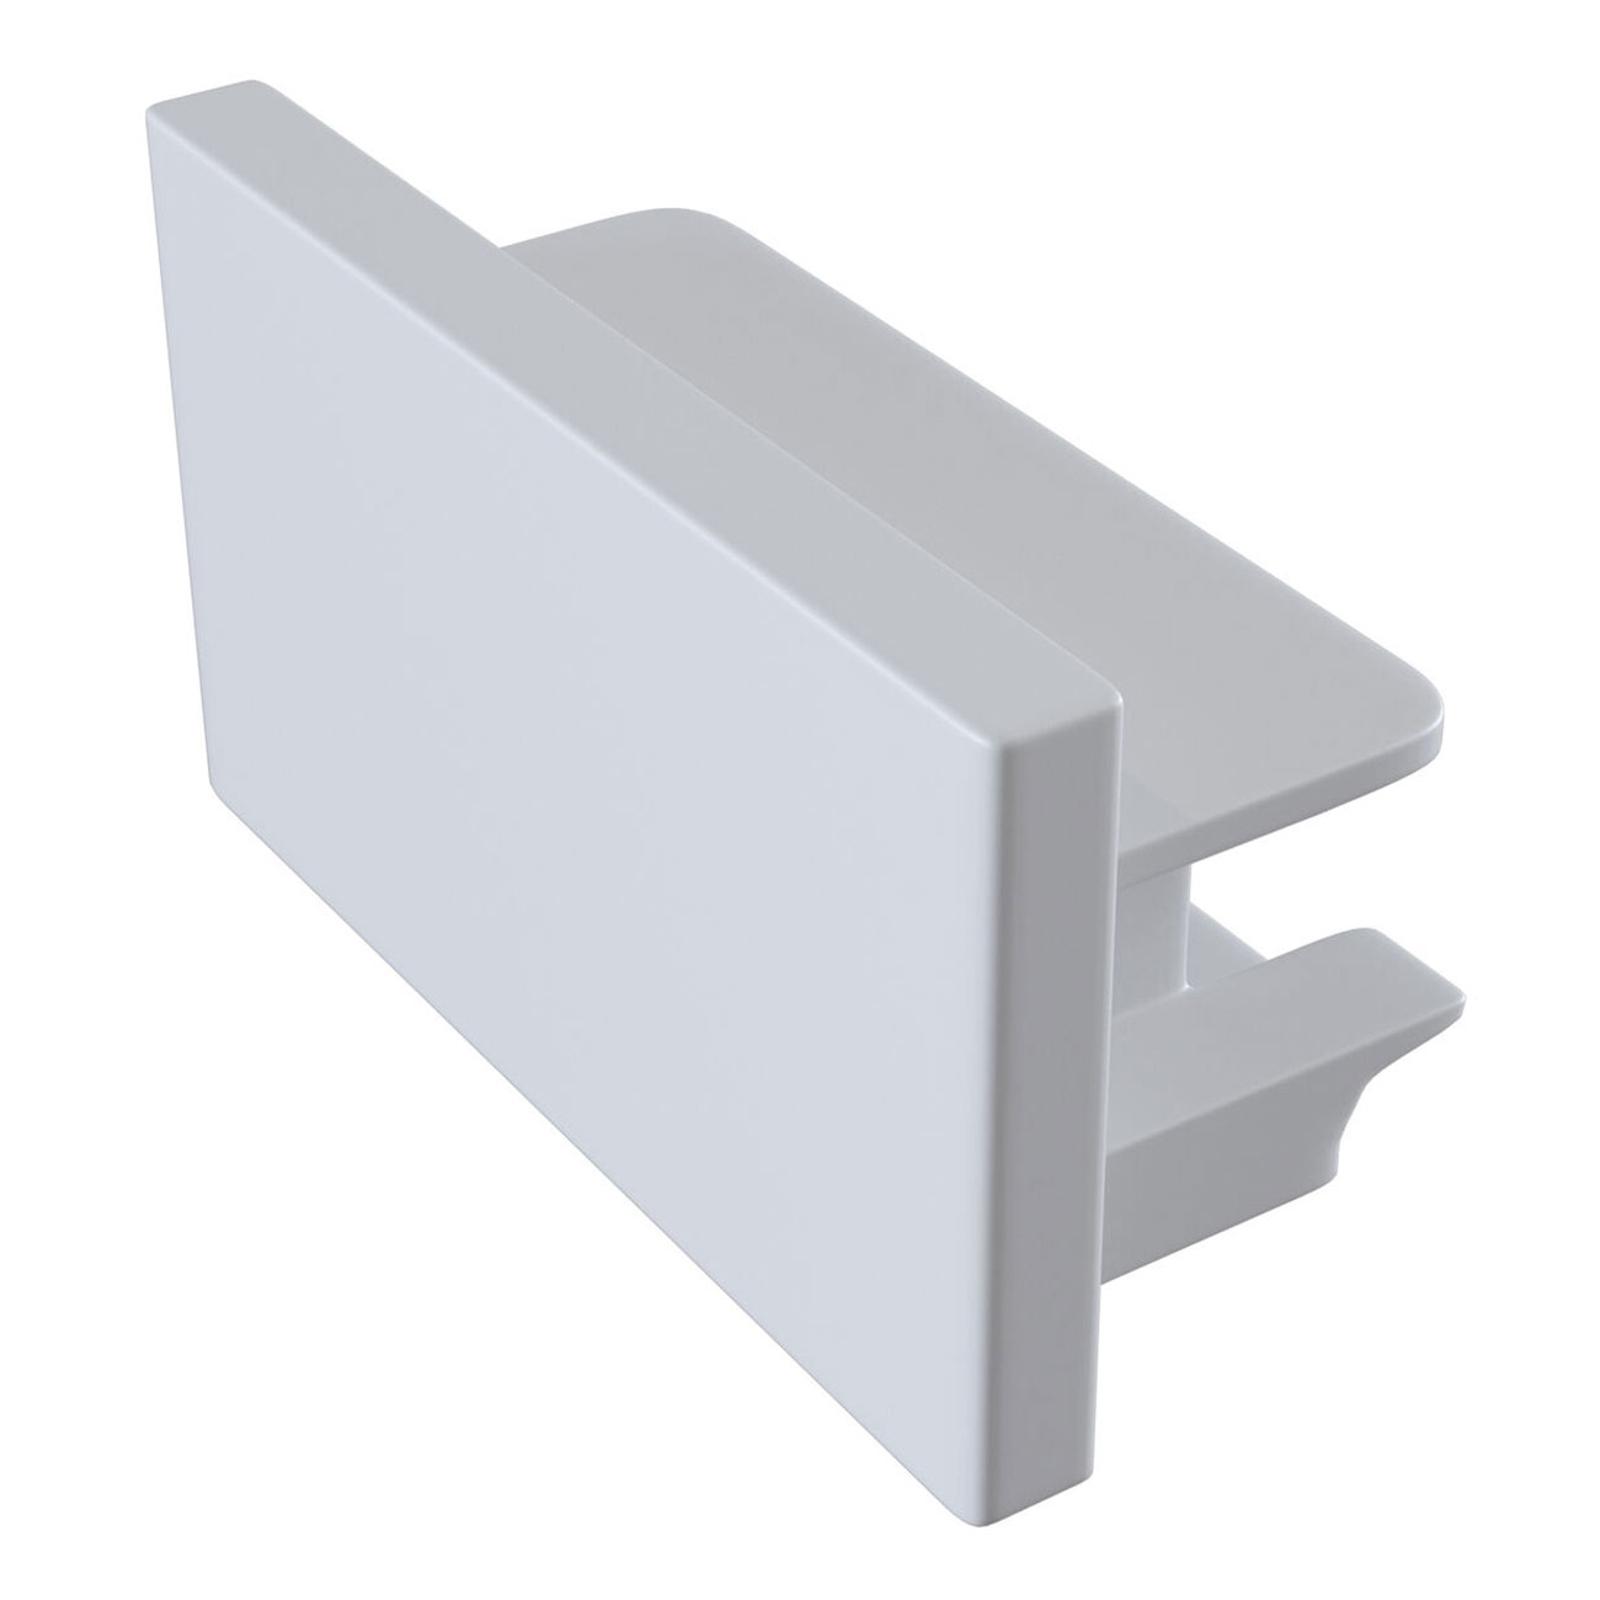 Endekappe Track, 1-faset skinne, hvid